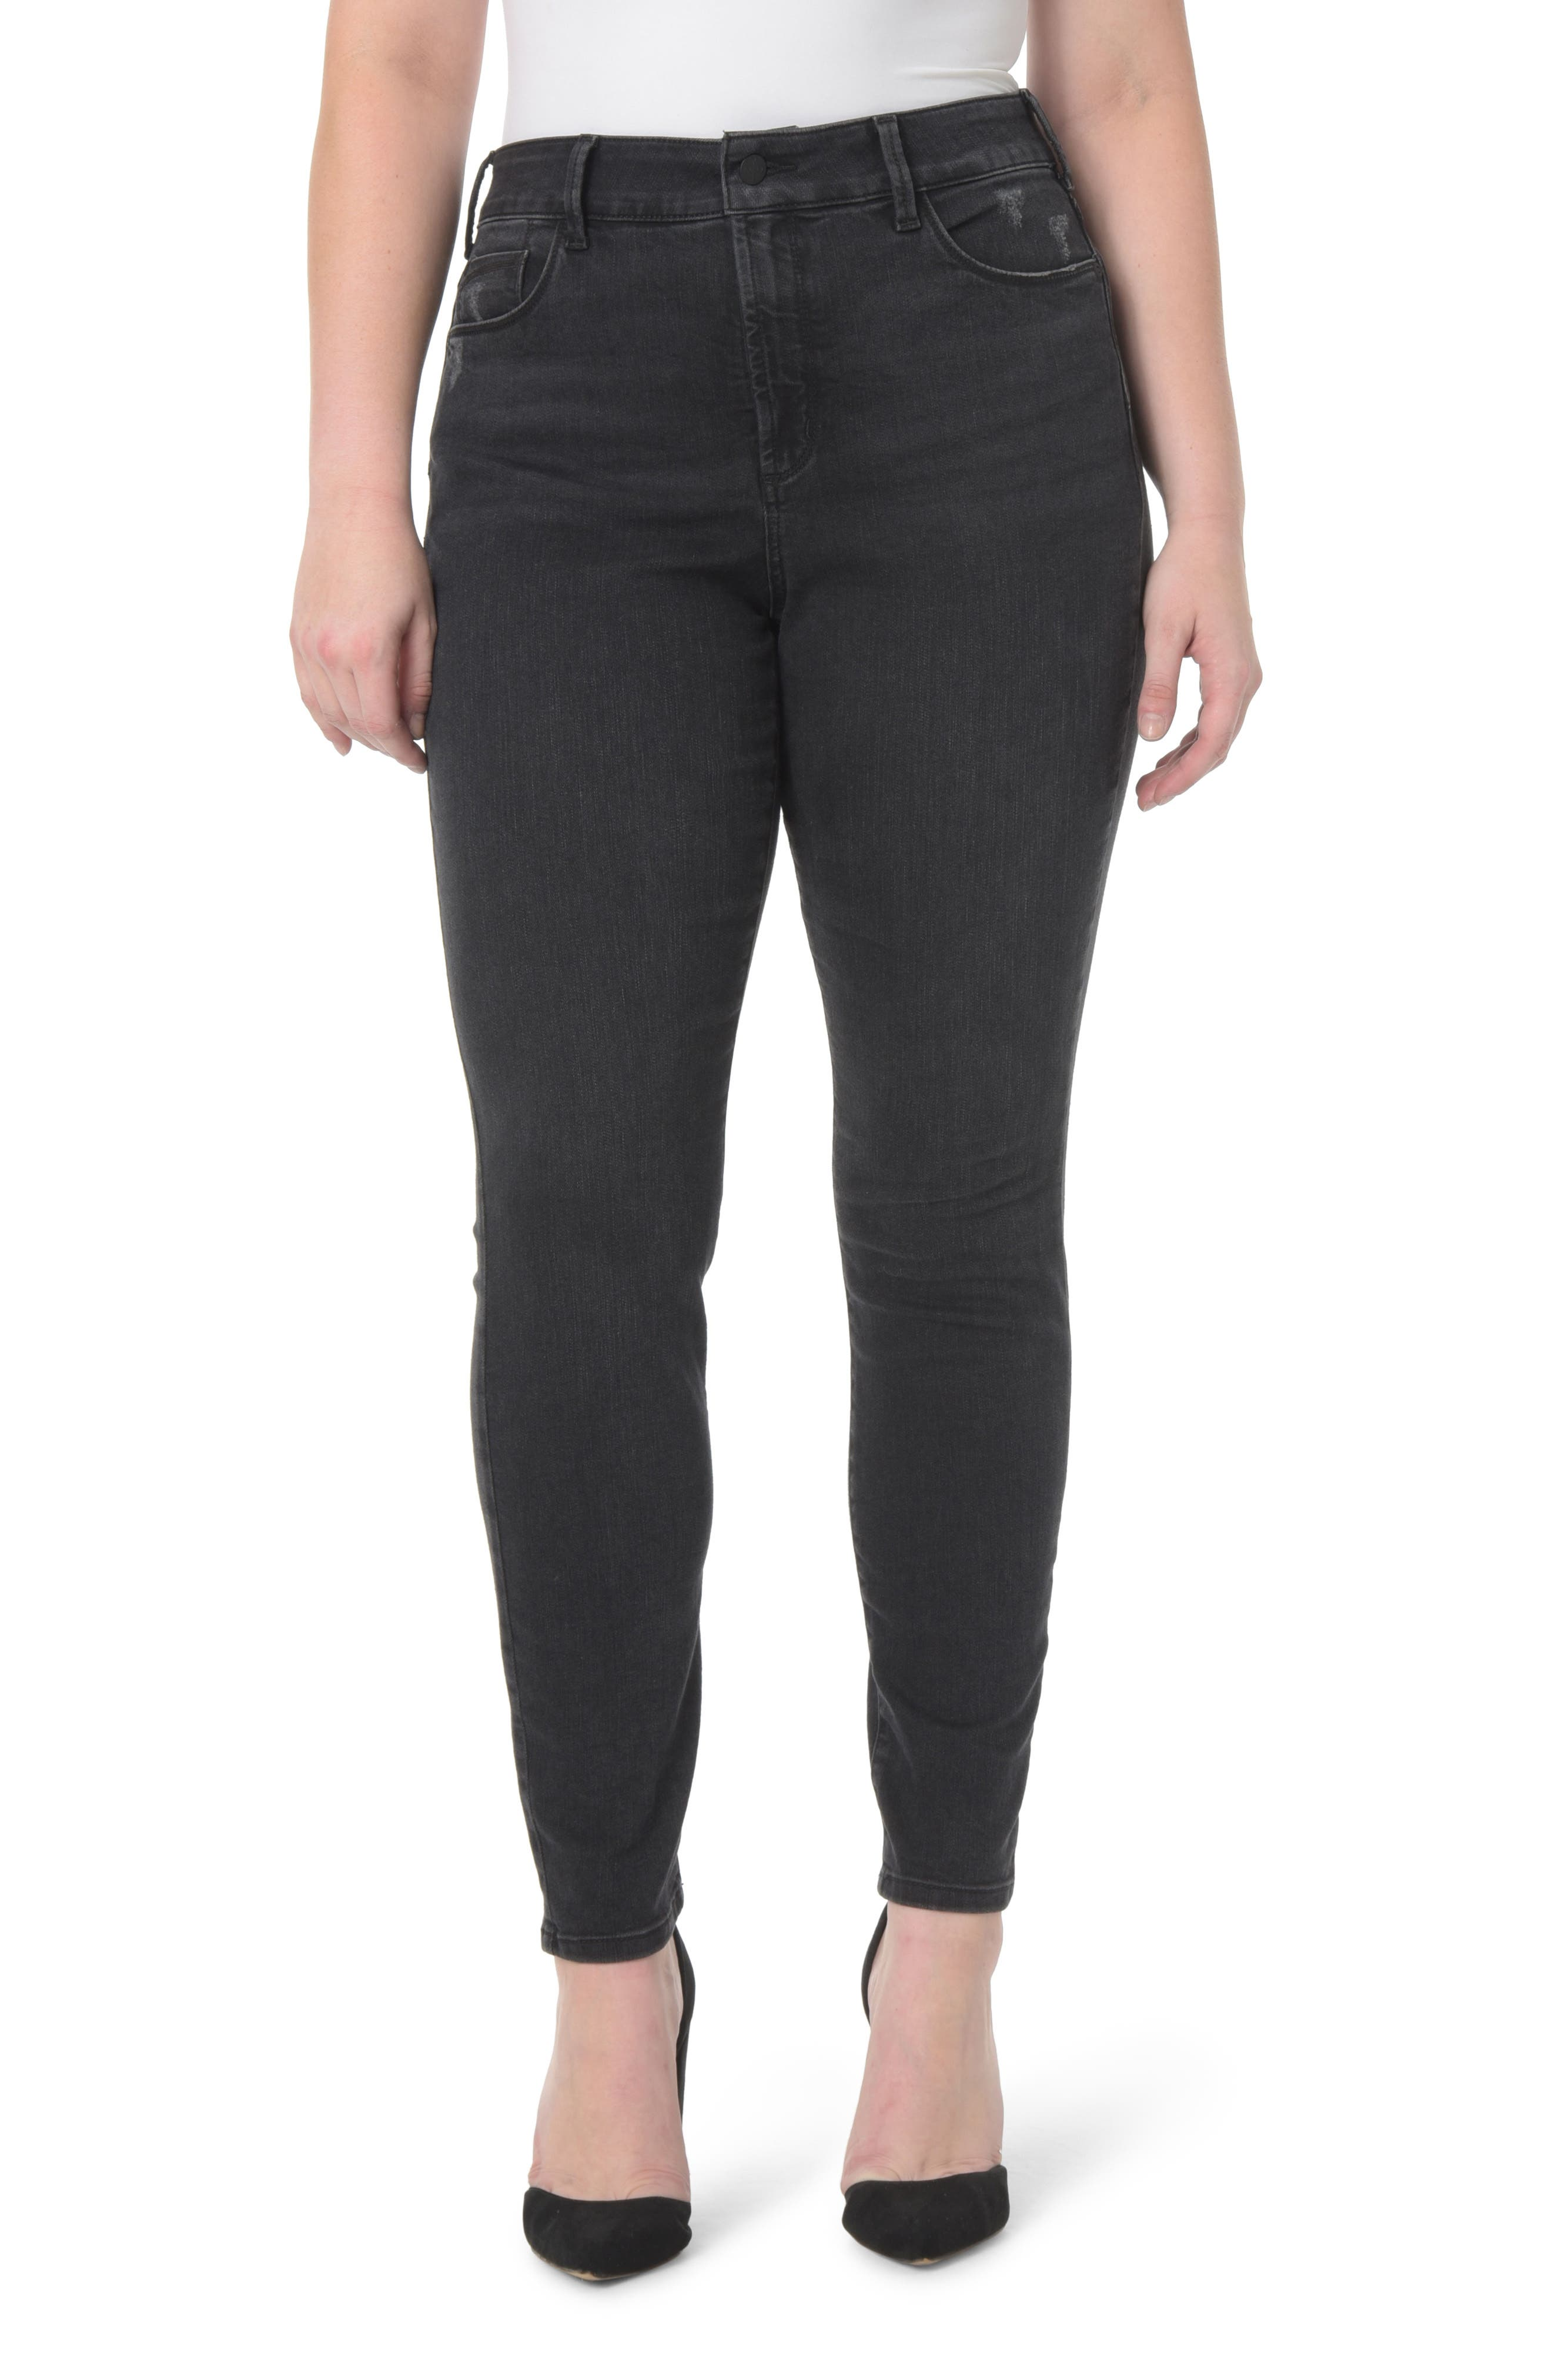 Alternate Image 1 Selected - NYDJ Alina Uplift Stretch Skinny Jeans (Plus Size)